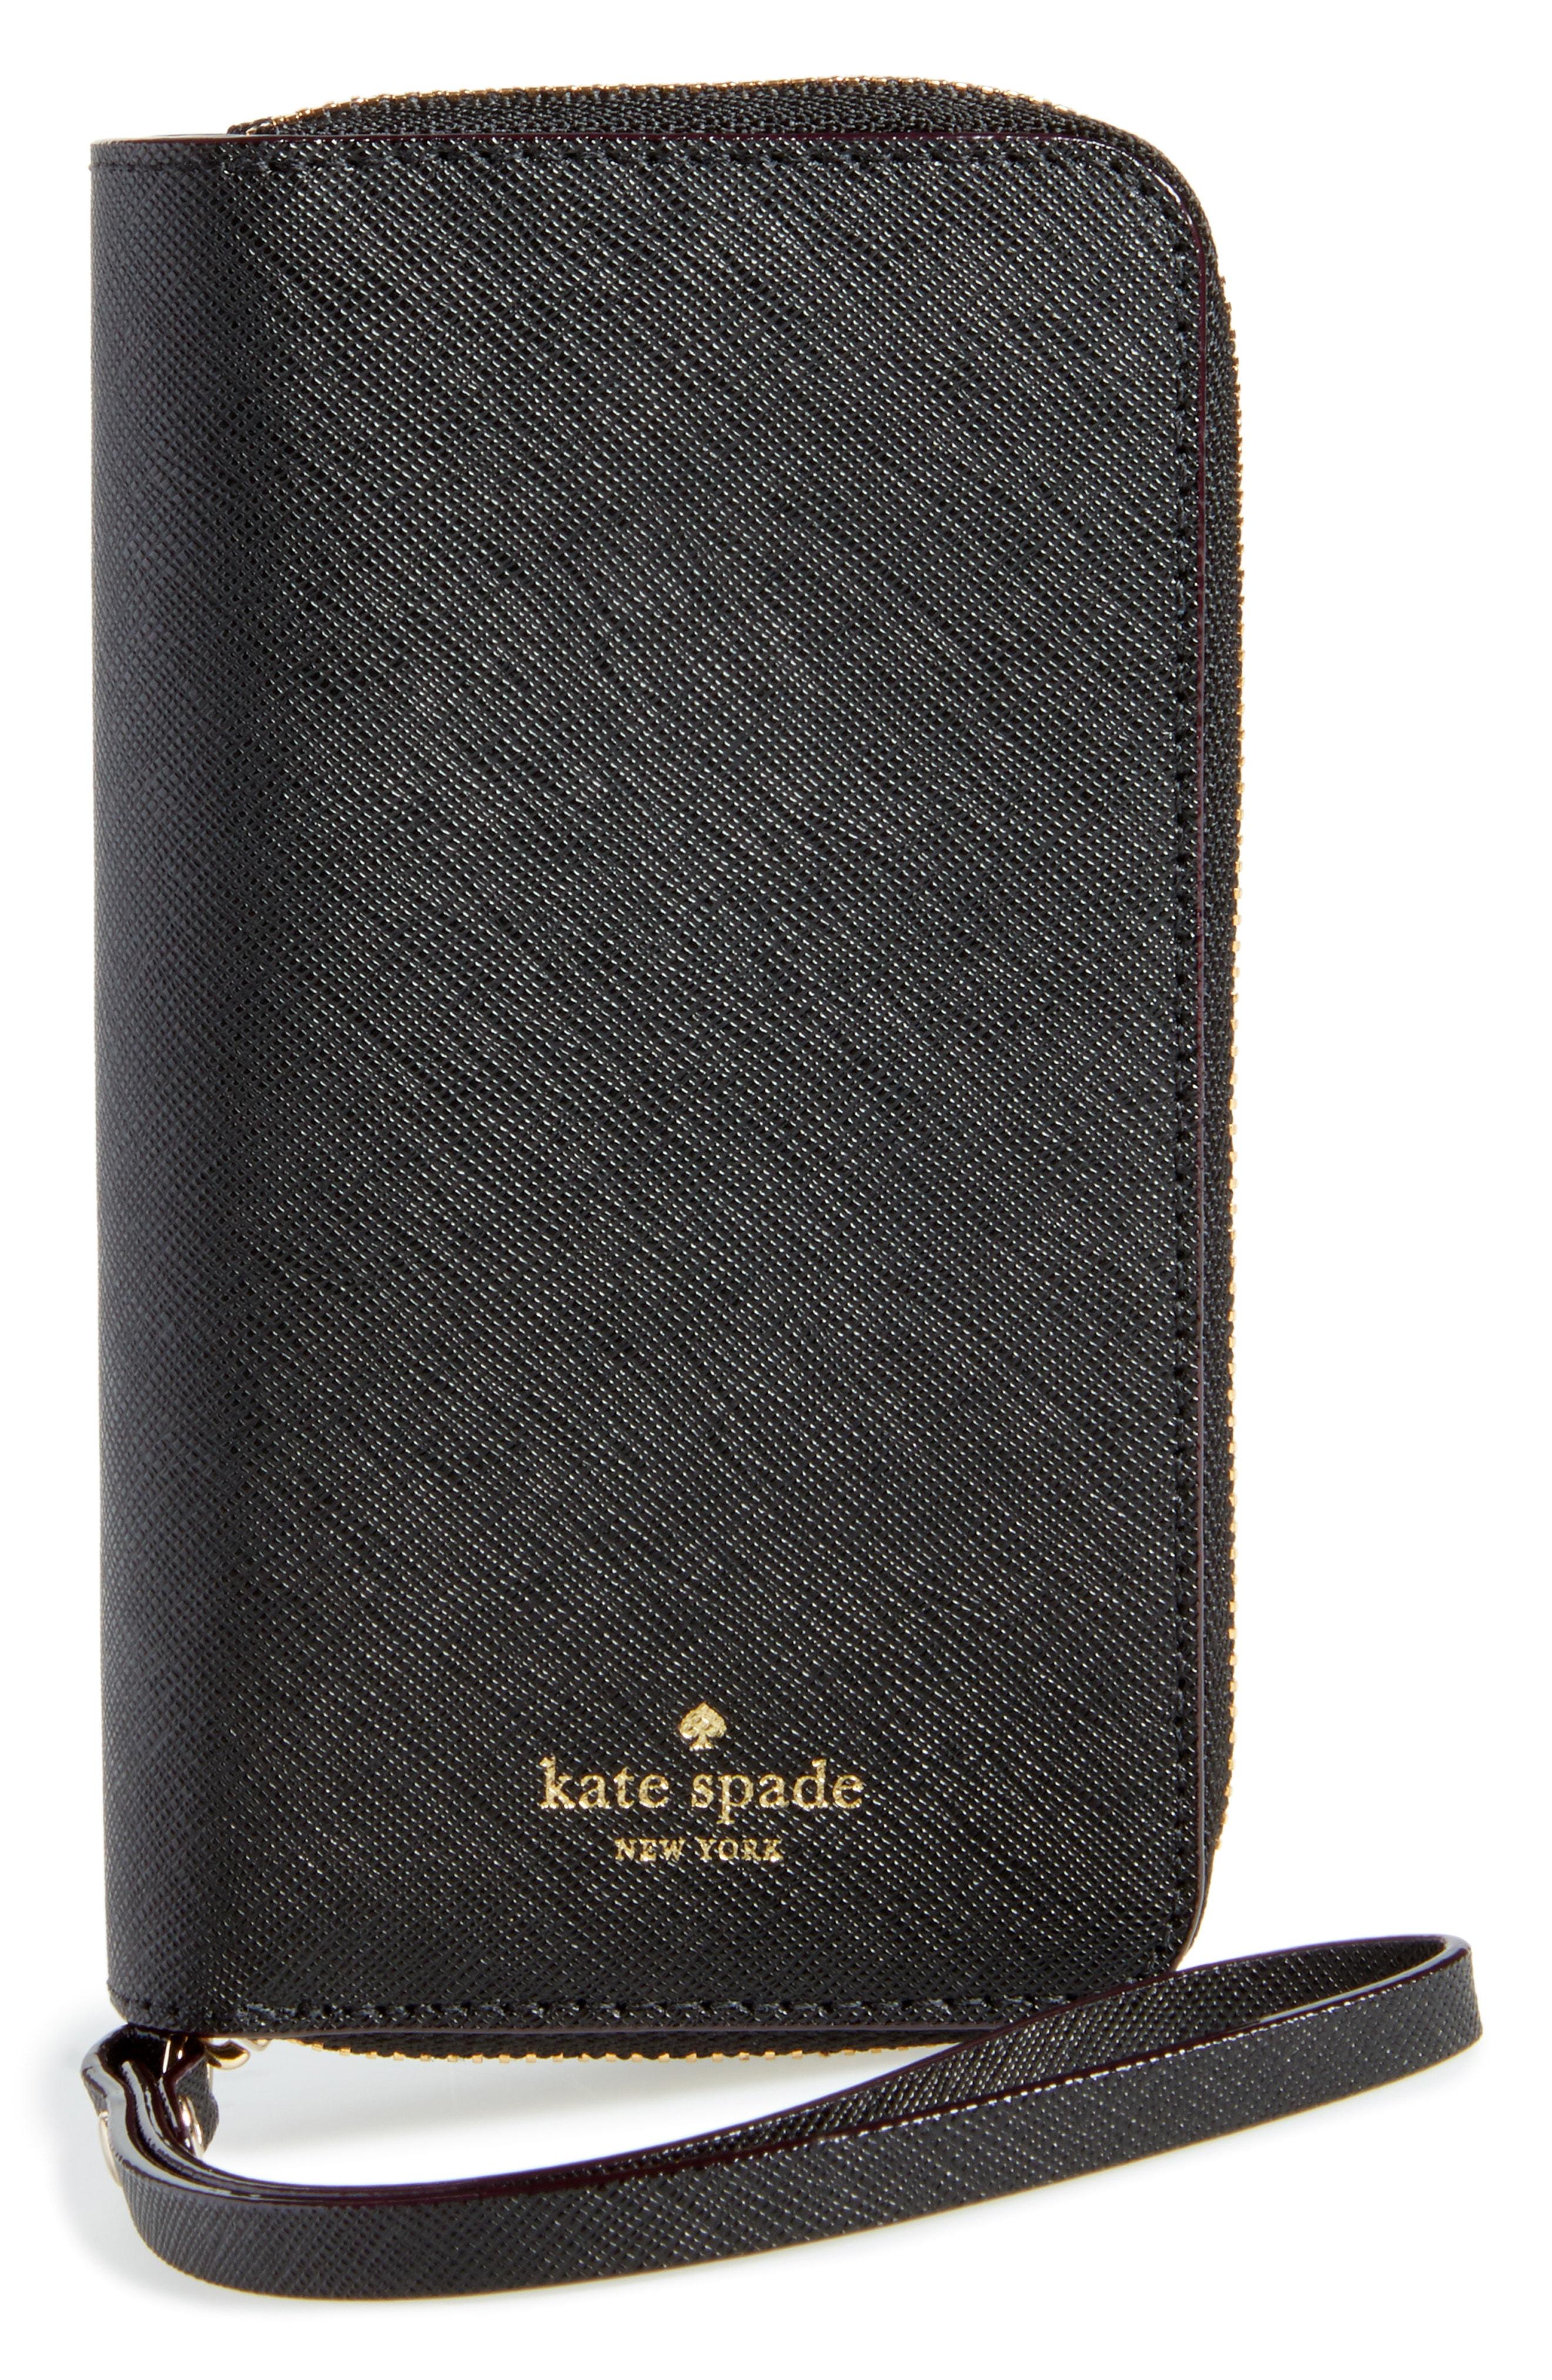 kate spade new york iPhone X/Xs leather folio wristlet